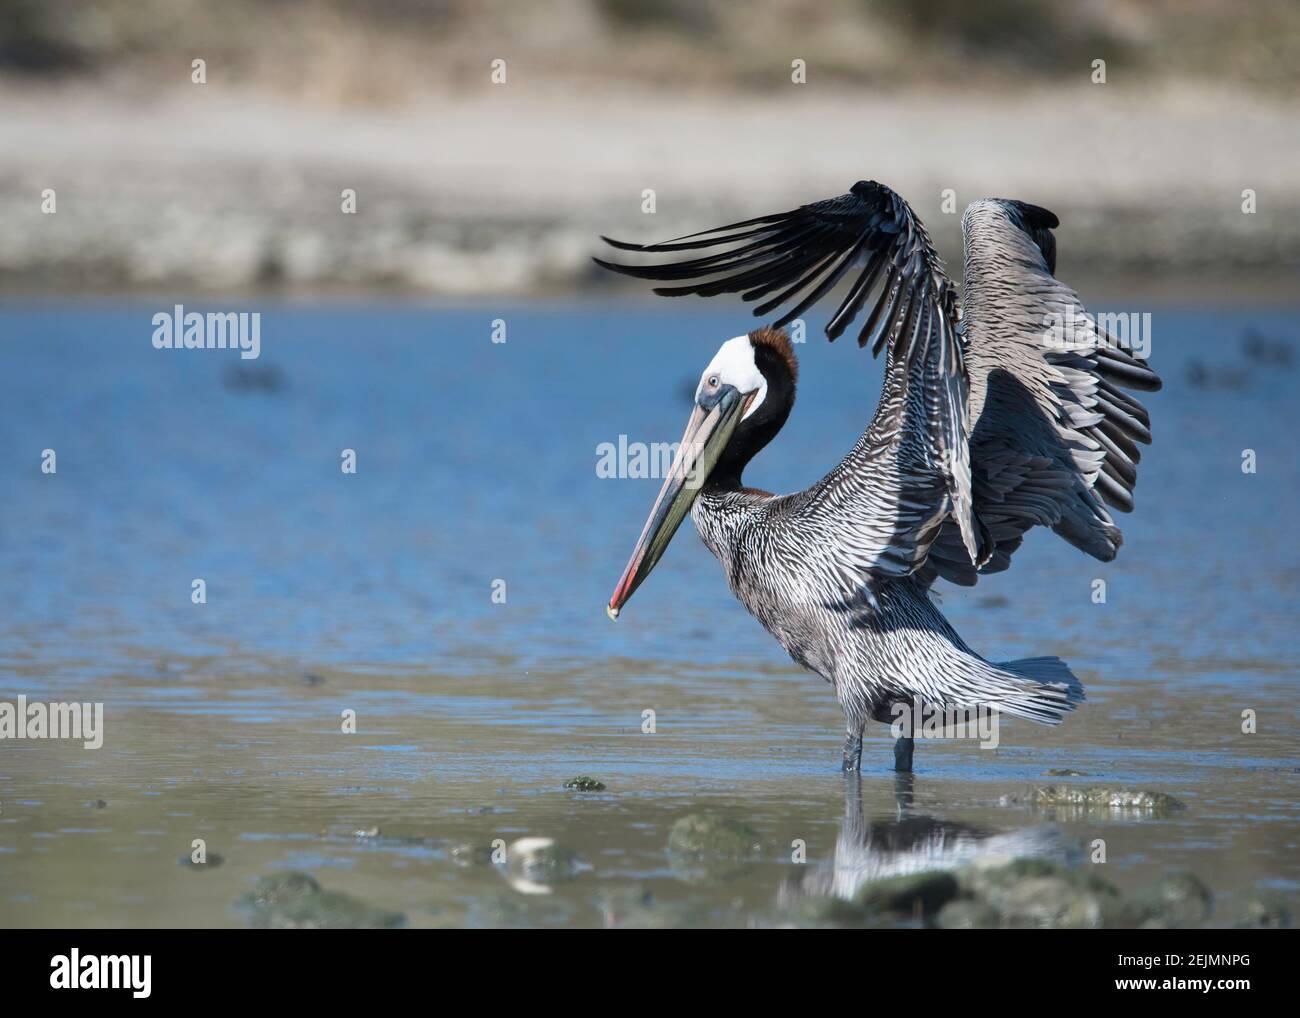 Brown Pelican (Pelecanus occidentalis) vuela por encima de la laguna Malibu SB, Malibu, CA. Foto de stock